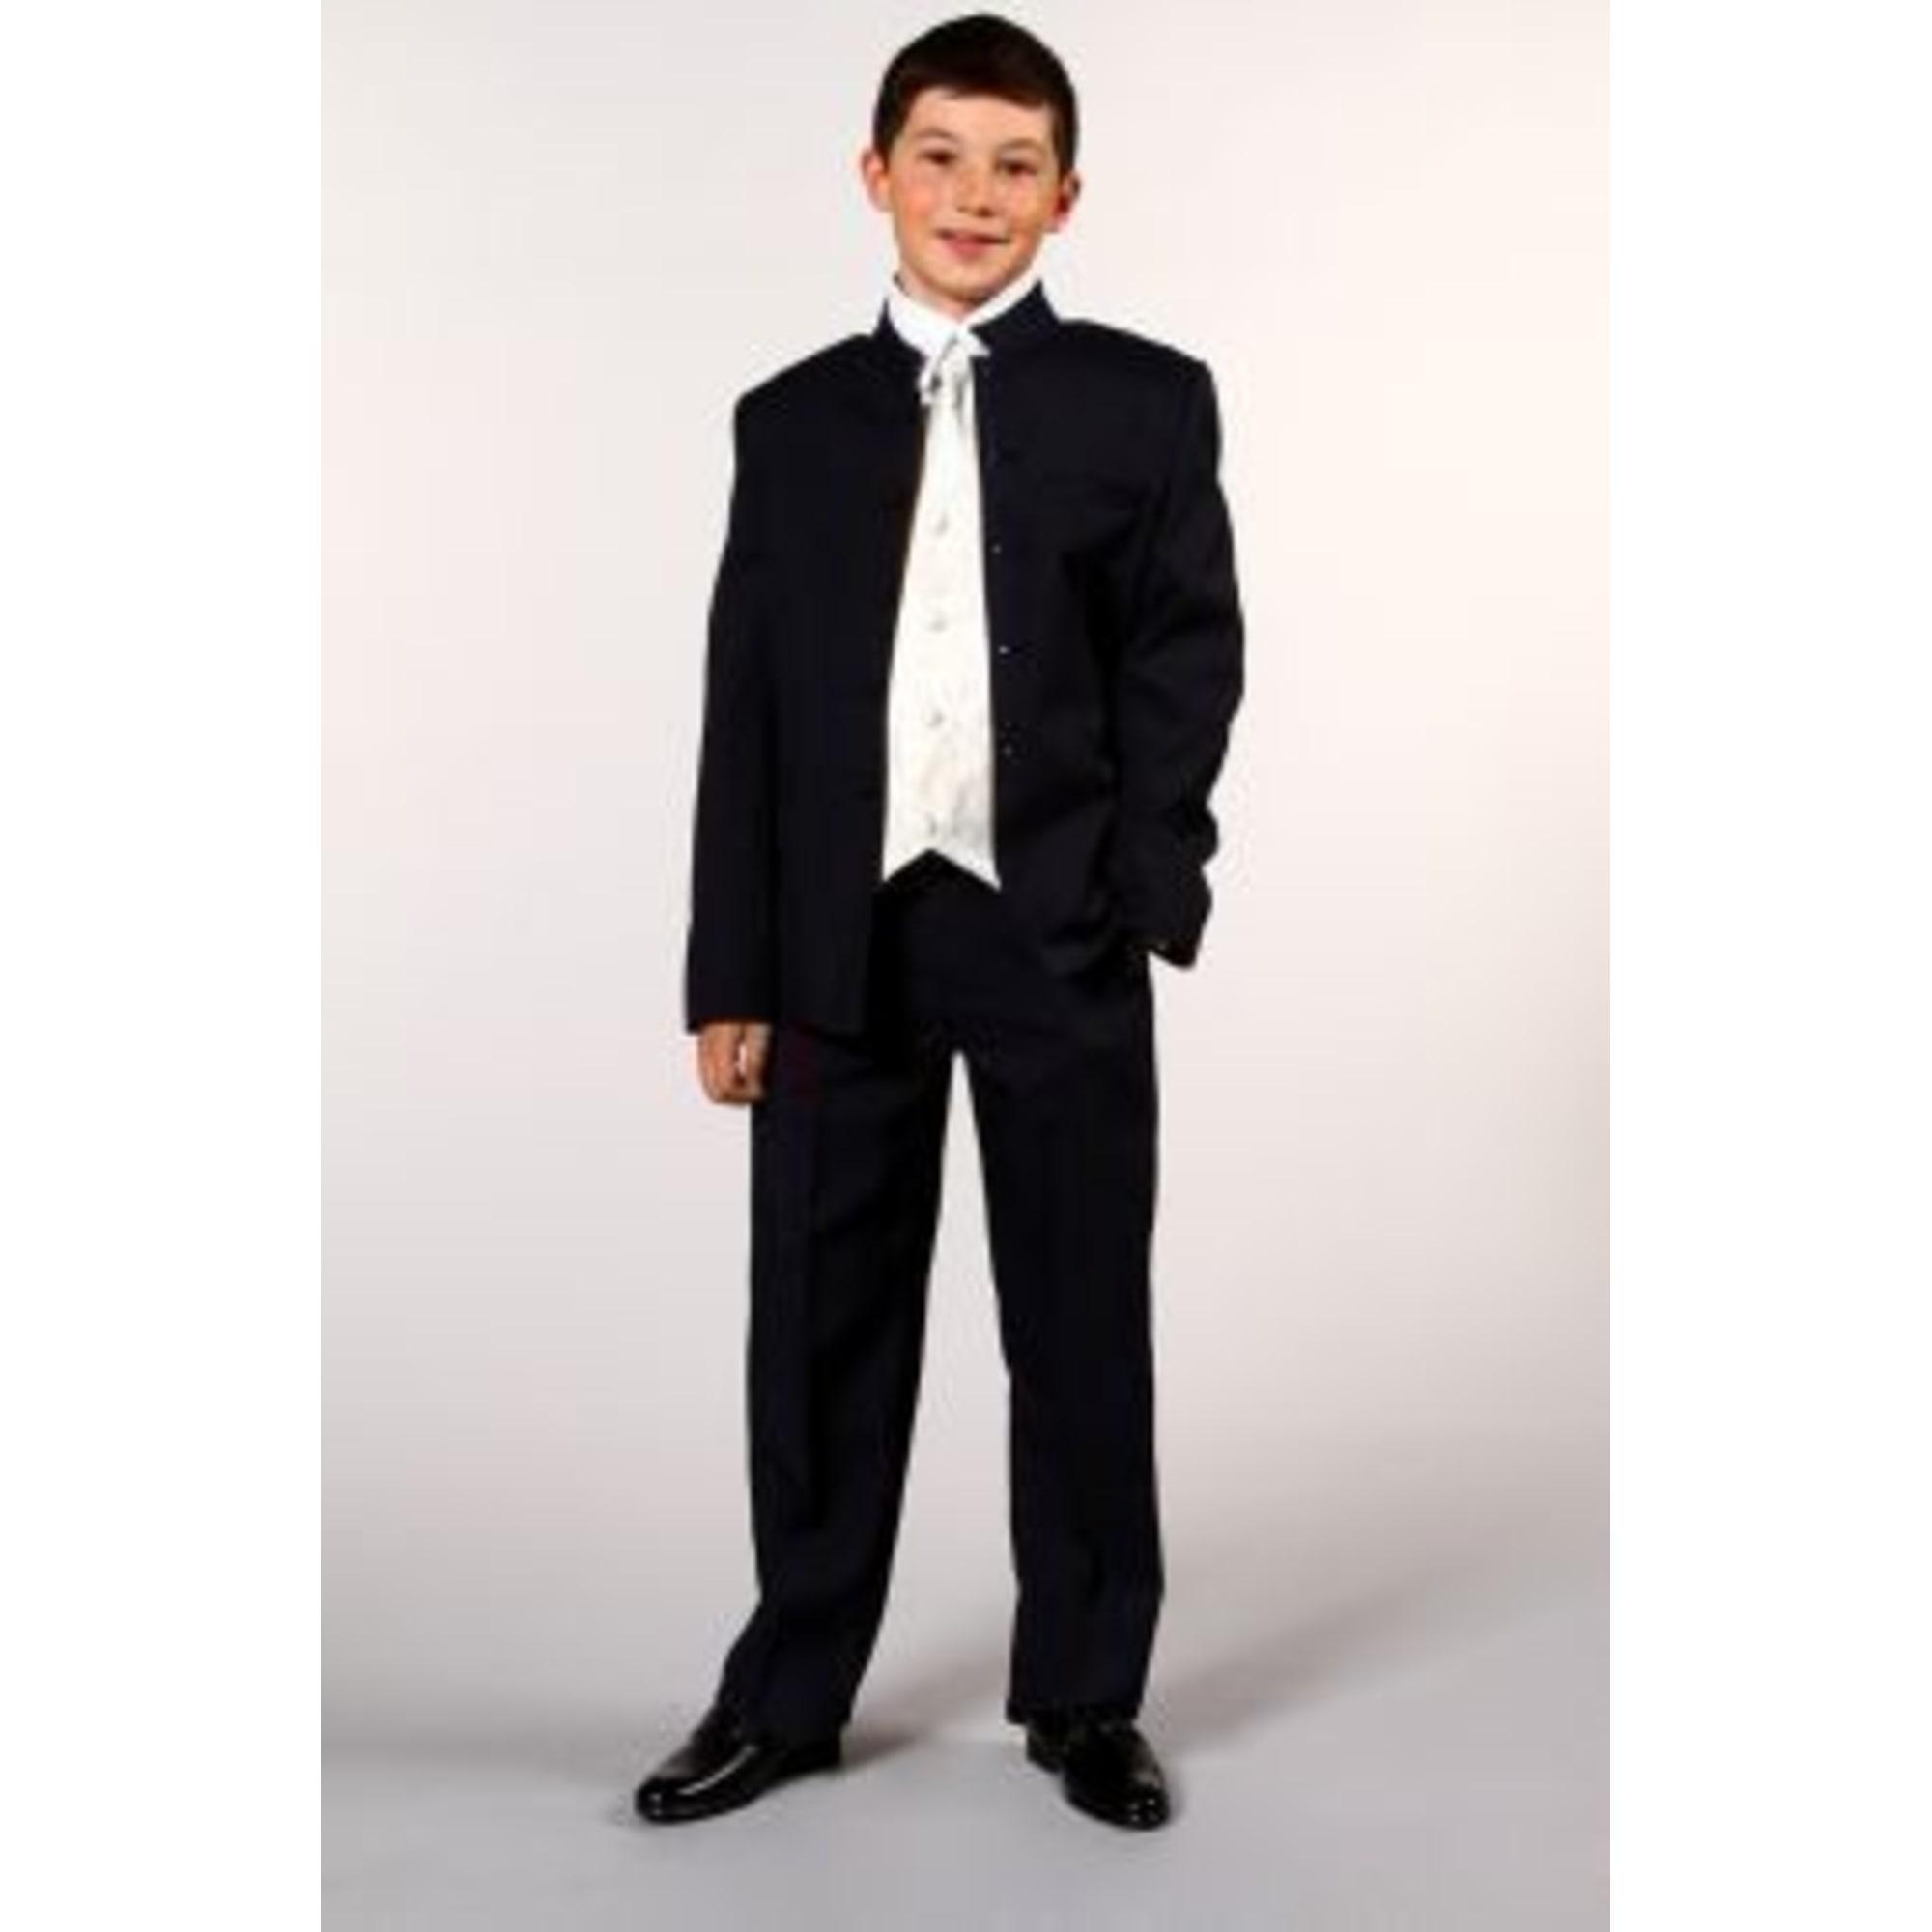 faecd35586b Costume complet TATI 3-4 ans noir vendu par Shopname204704 ...